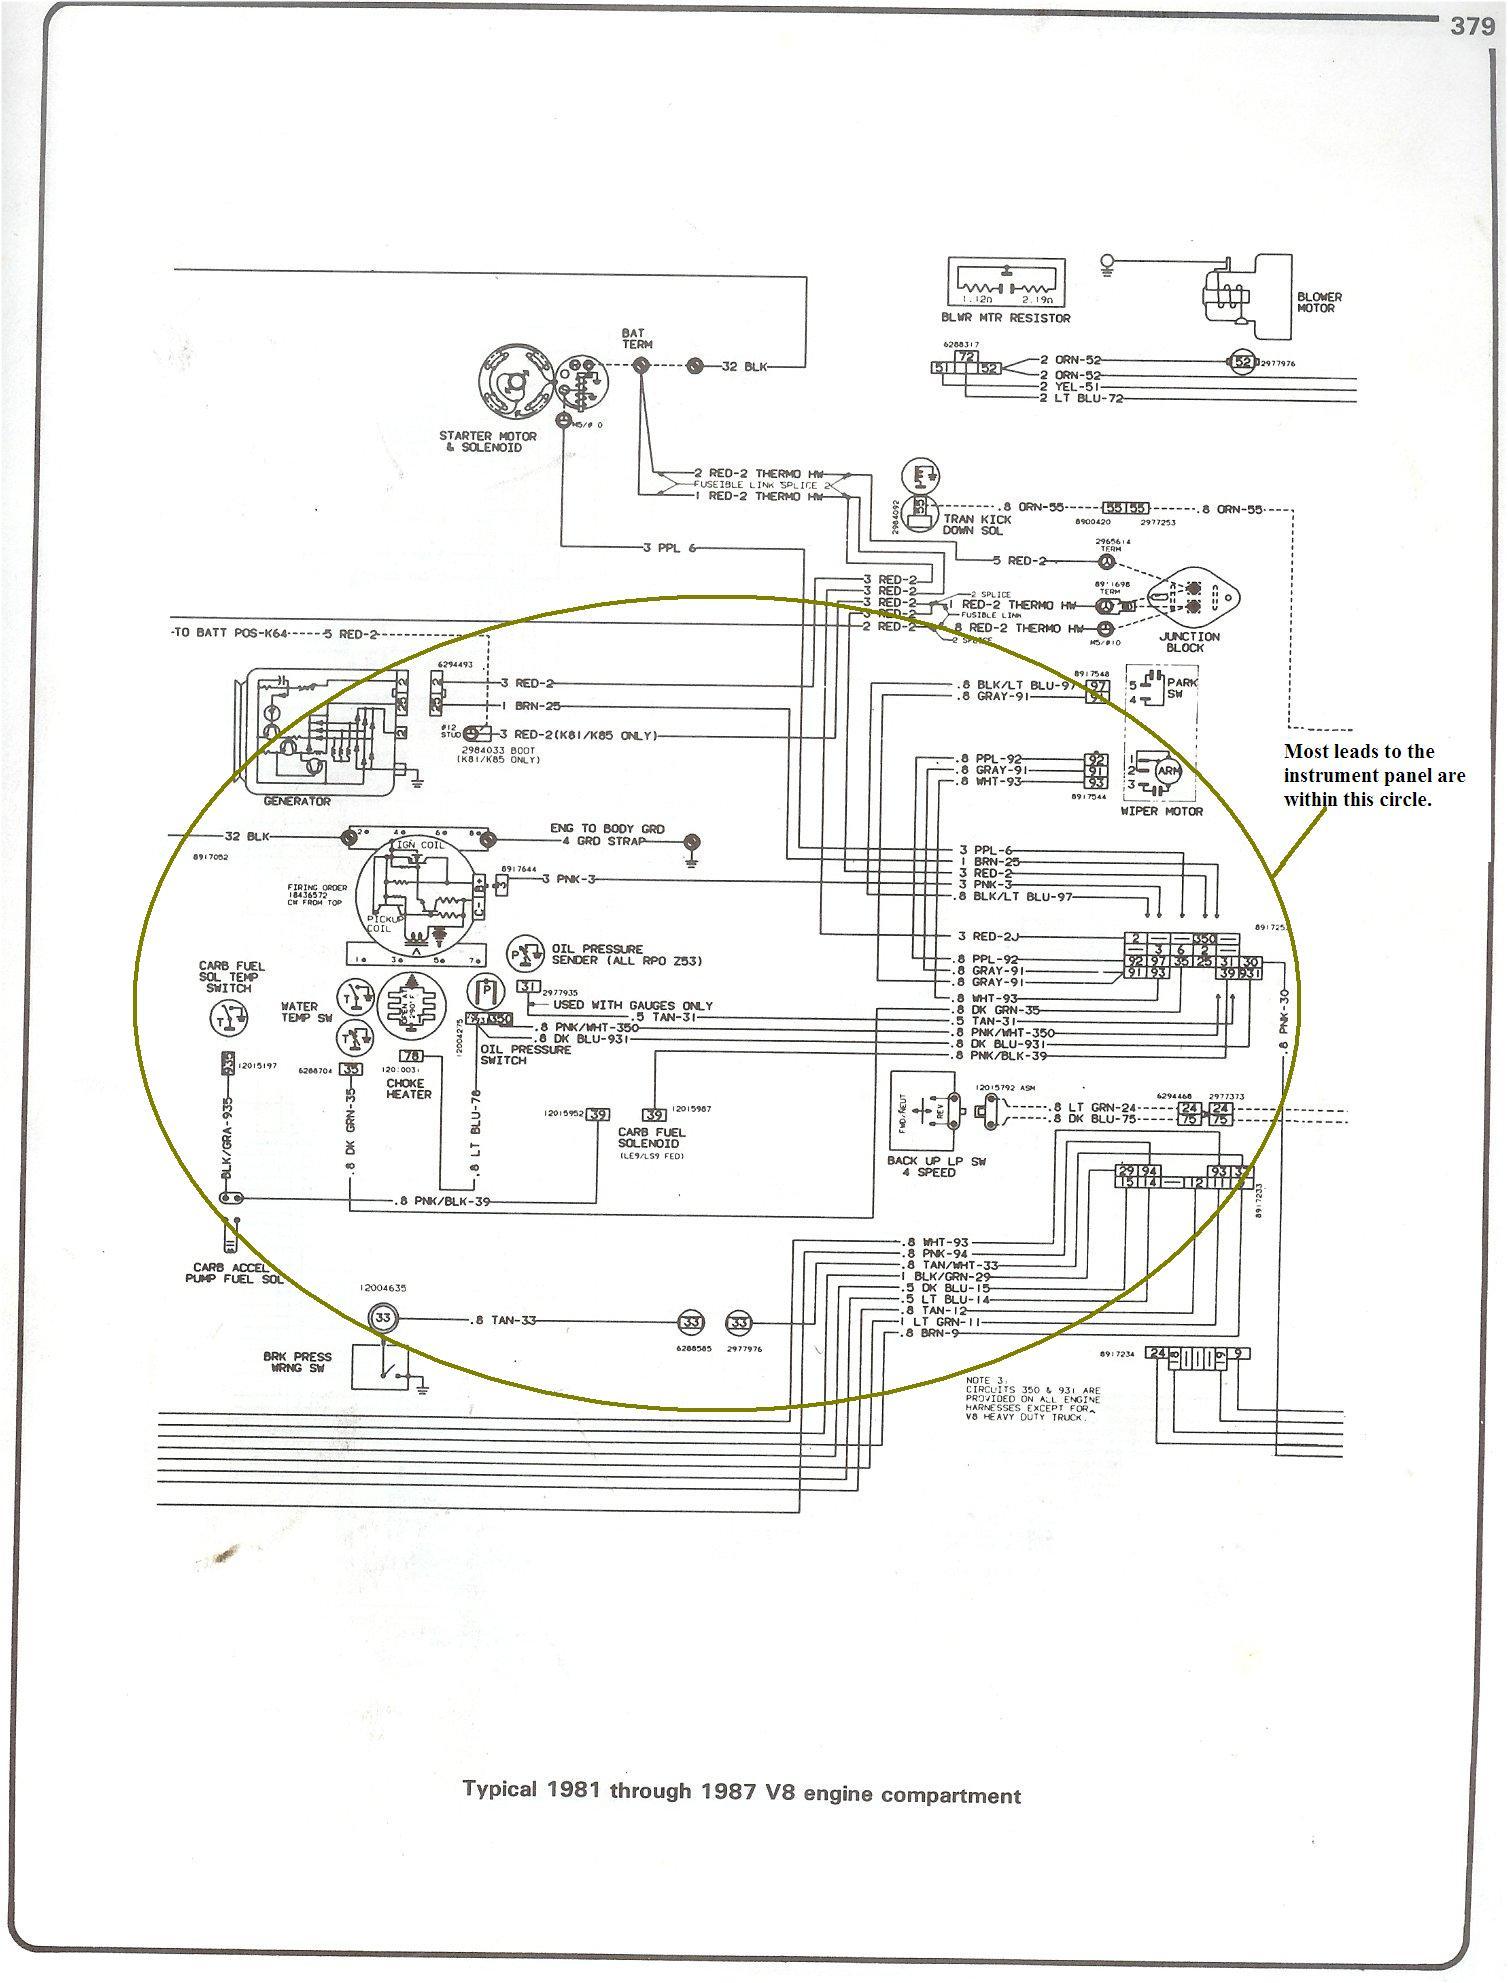 2 81 87 V 8 Engine 2 81 87 V8 Engine